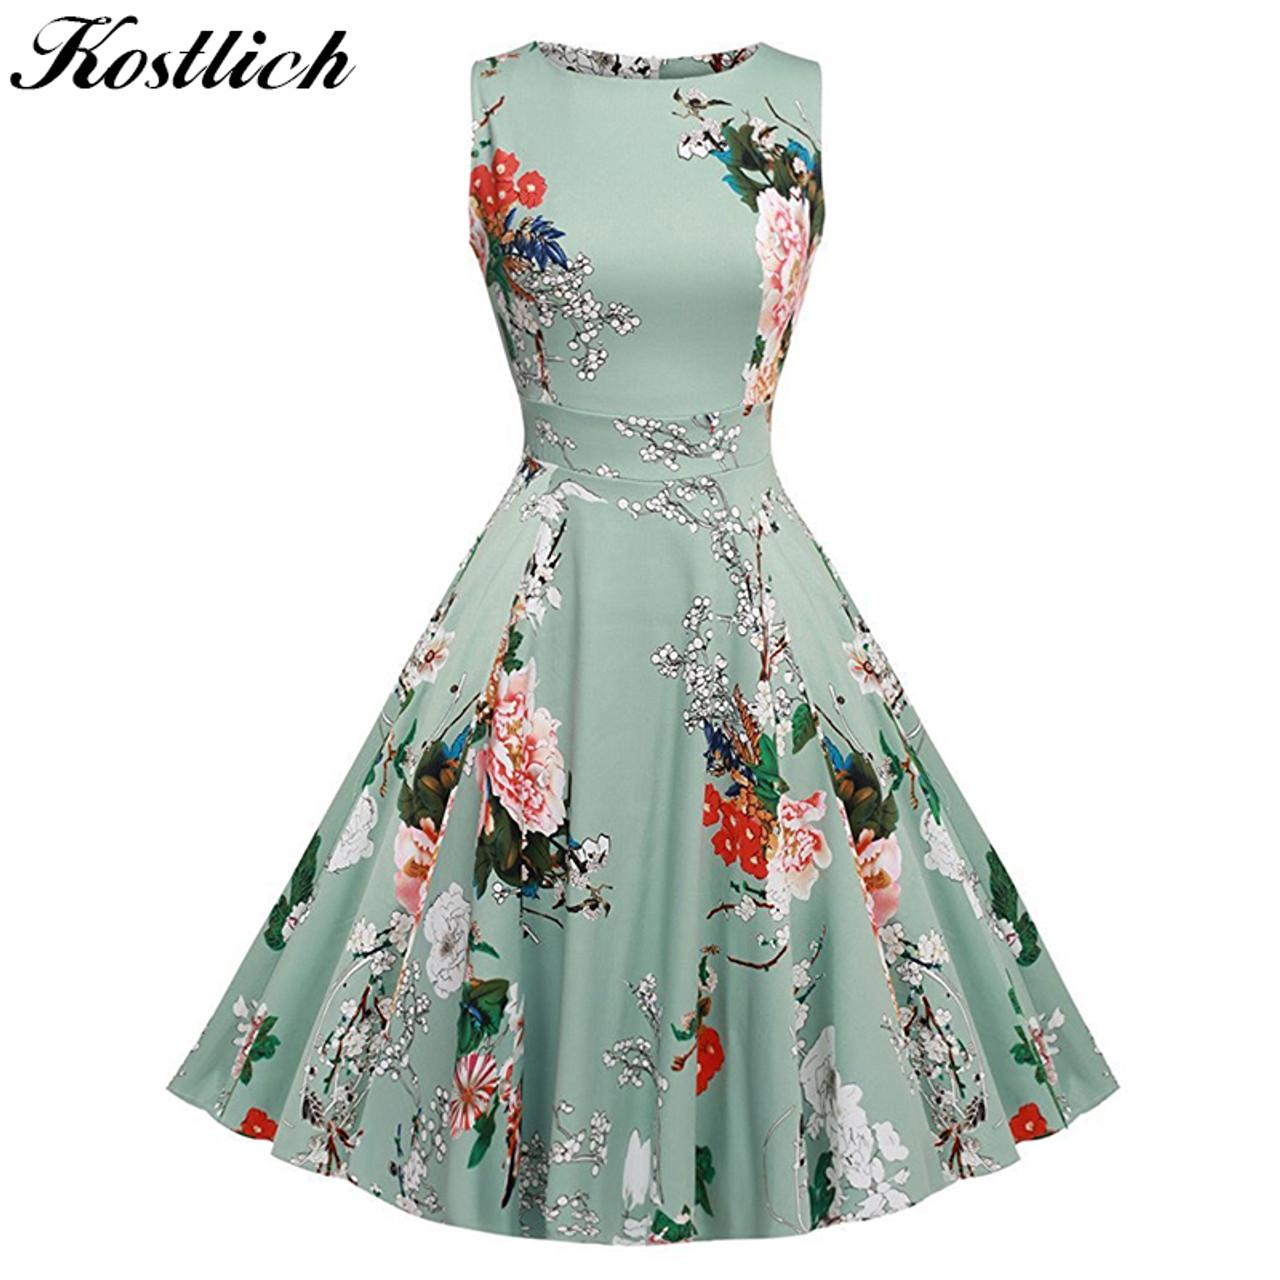 a0e2605b2d0 Kostlich Floral Print Summer Dress Women 2018 Sleeveless Tunic 50s Vintage  Dress Belt Elegant Rockabilly Party ...